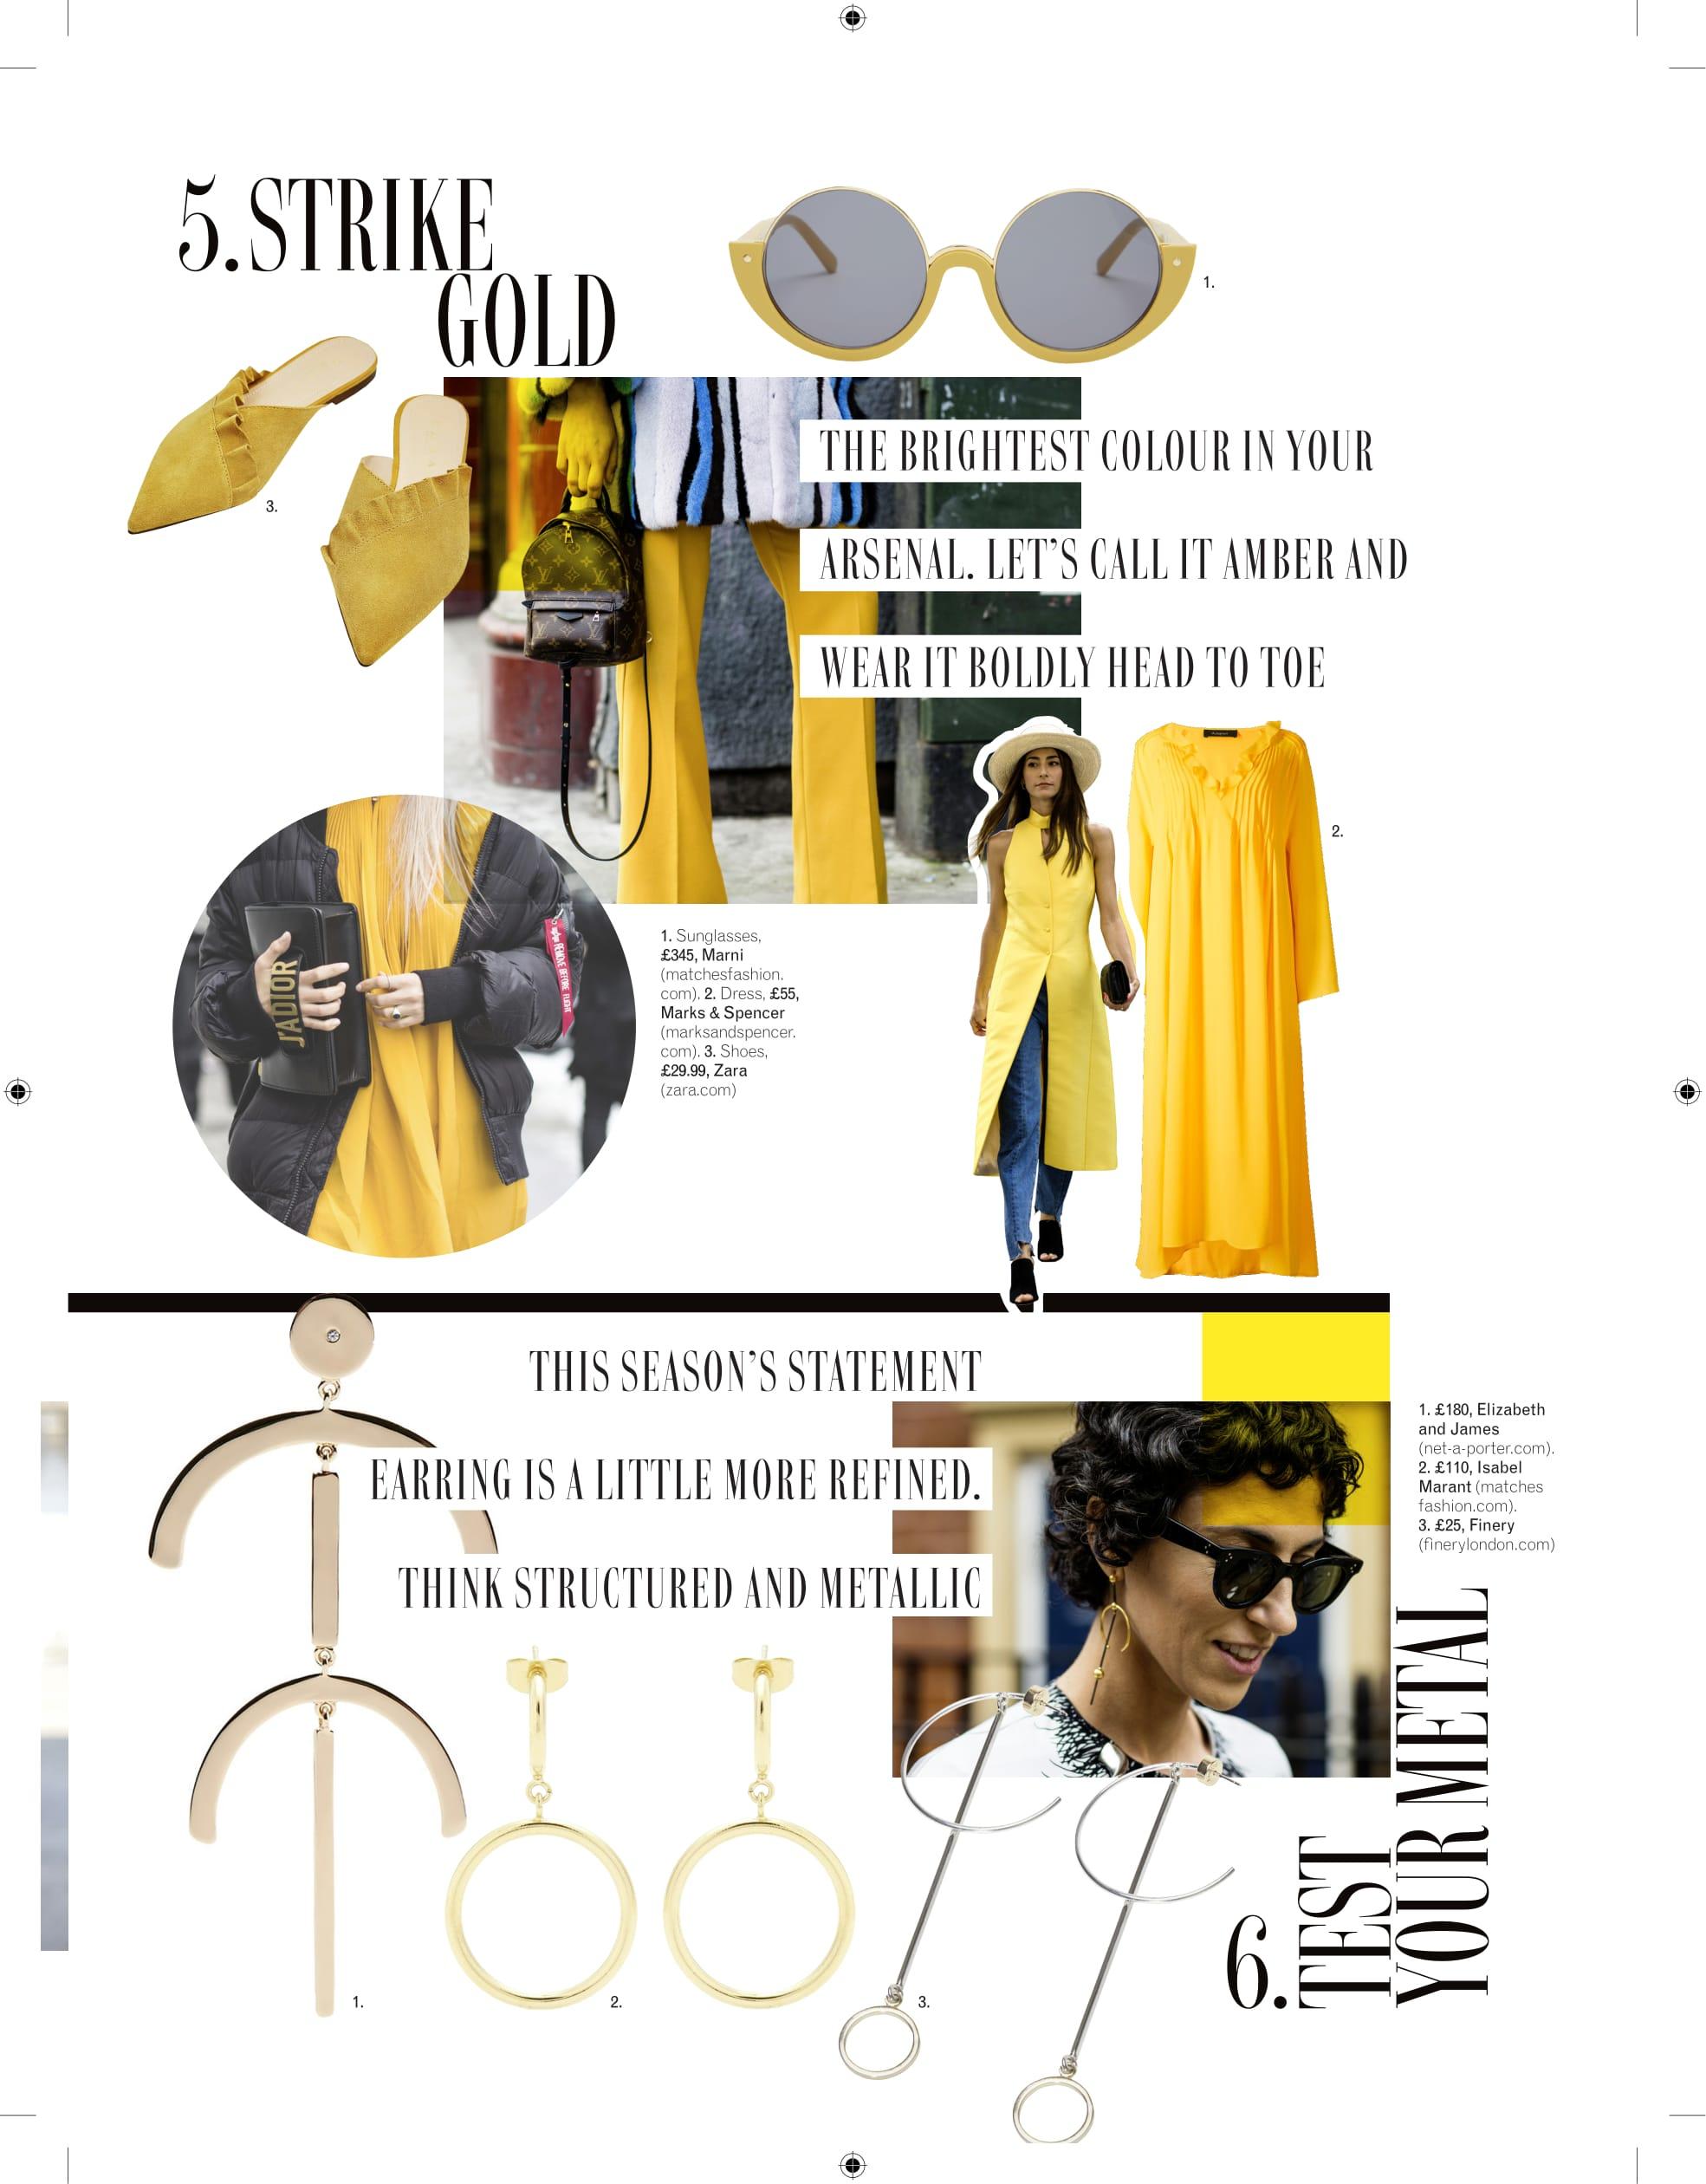 Fashion_STREET STYLE SPESH 6pp_pdf_4-1 copy.jpg